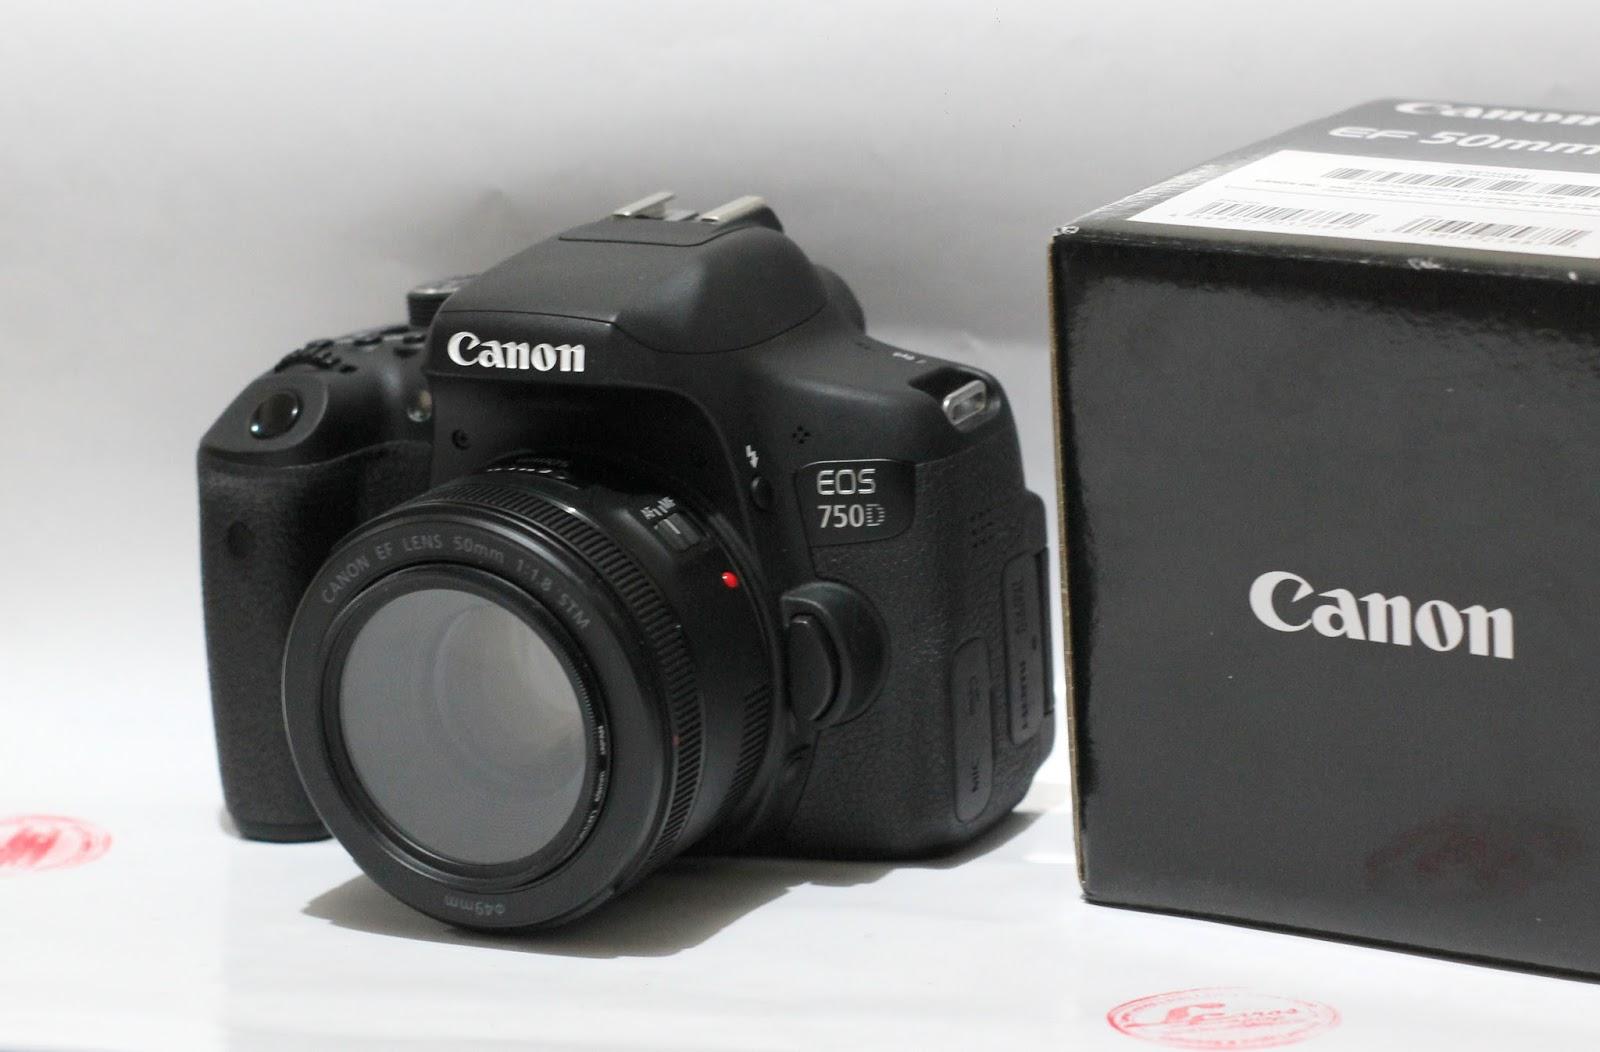 Jual Kamera Canon Eos 750D WiFi